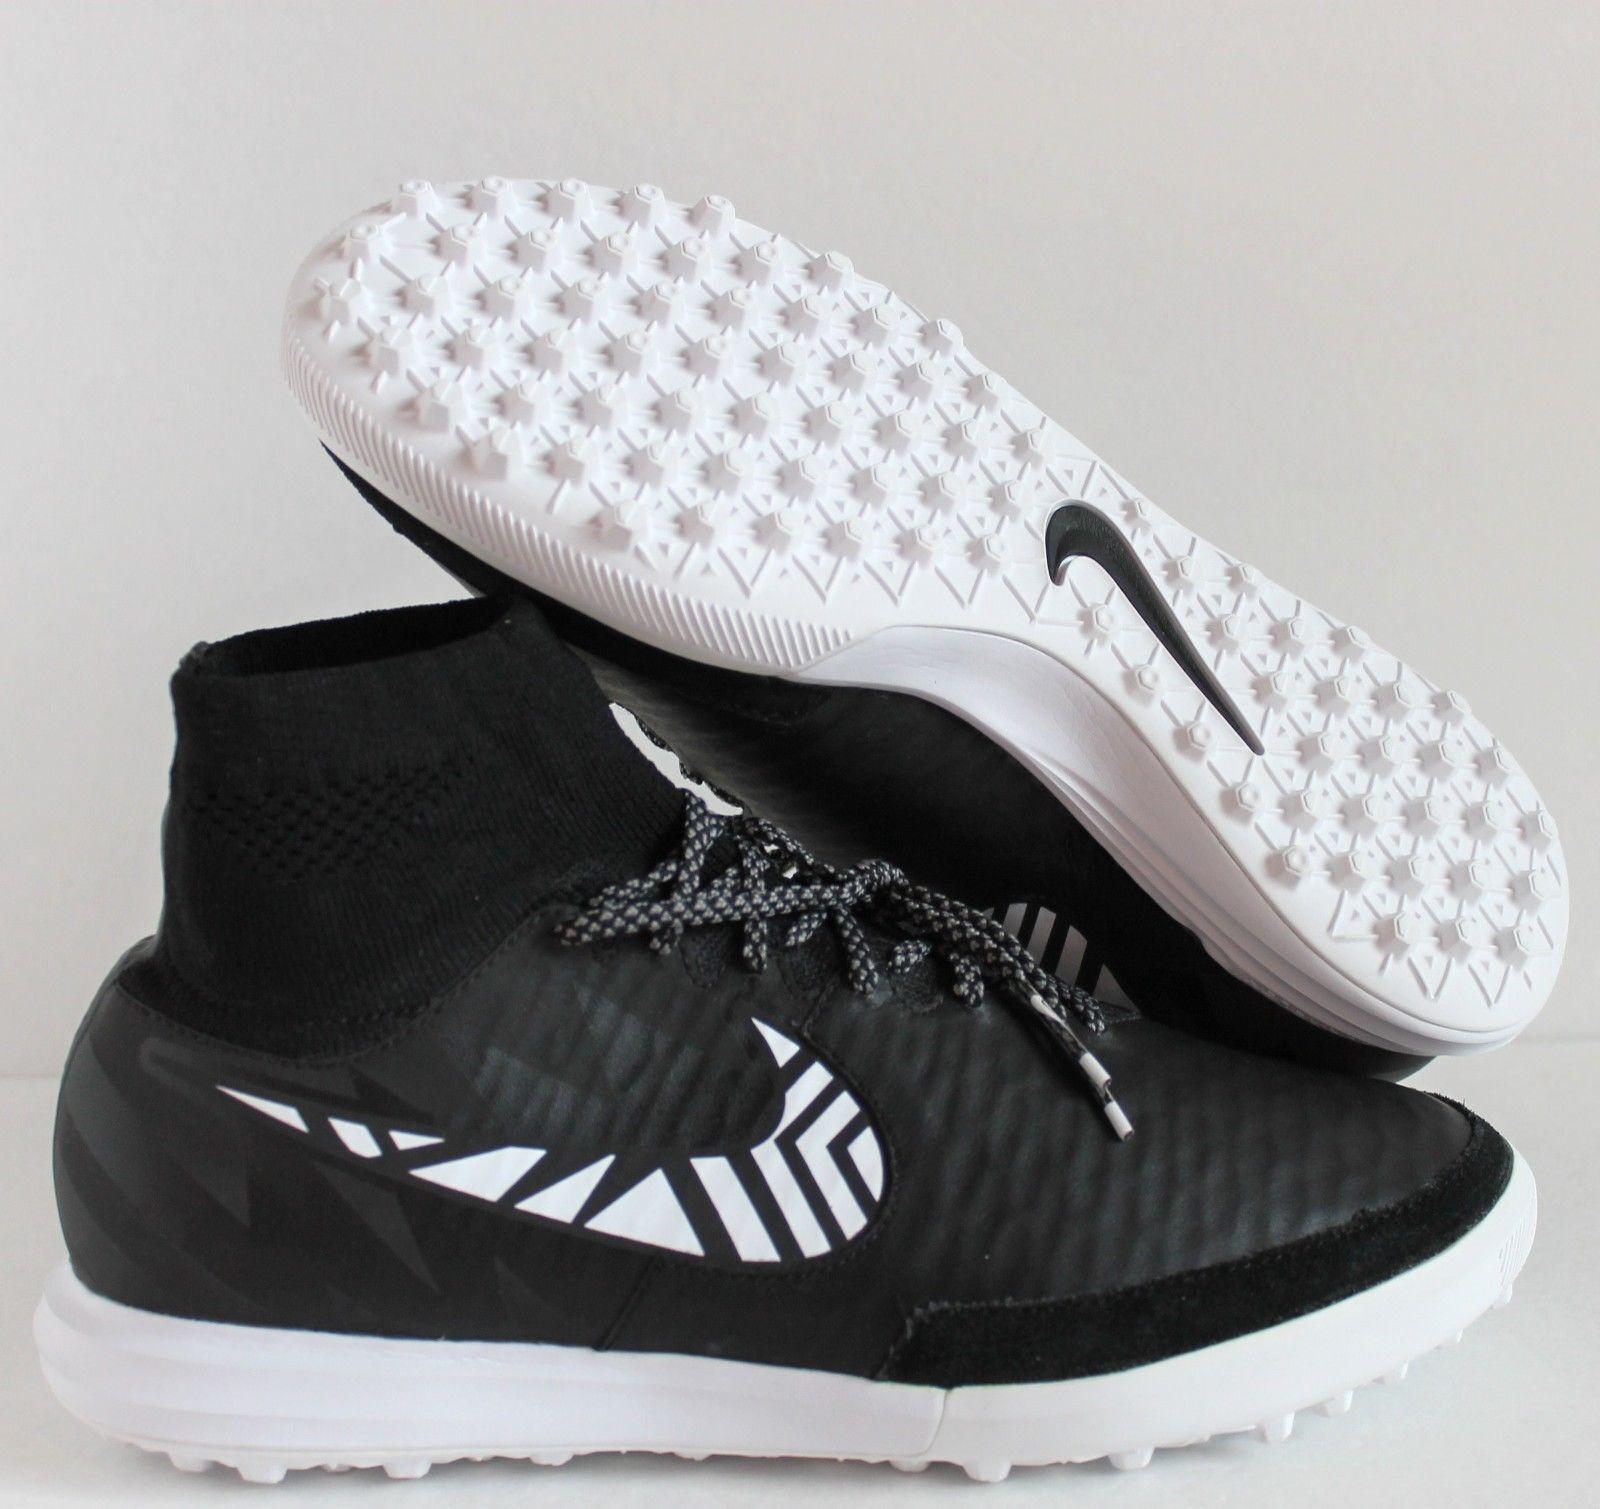 Nike Magista X Proximo Street Tf Hombre Fútbol Tacos Negro   blancoo 718361-010